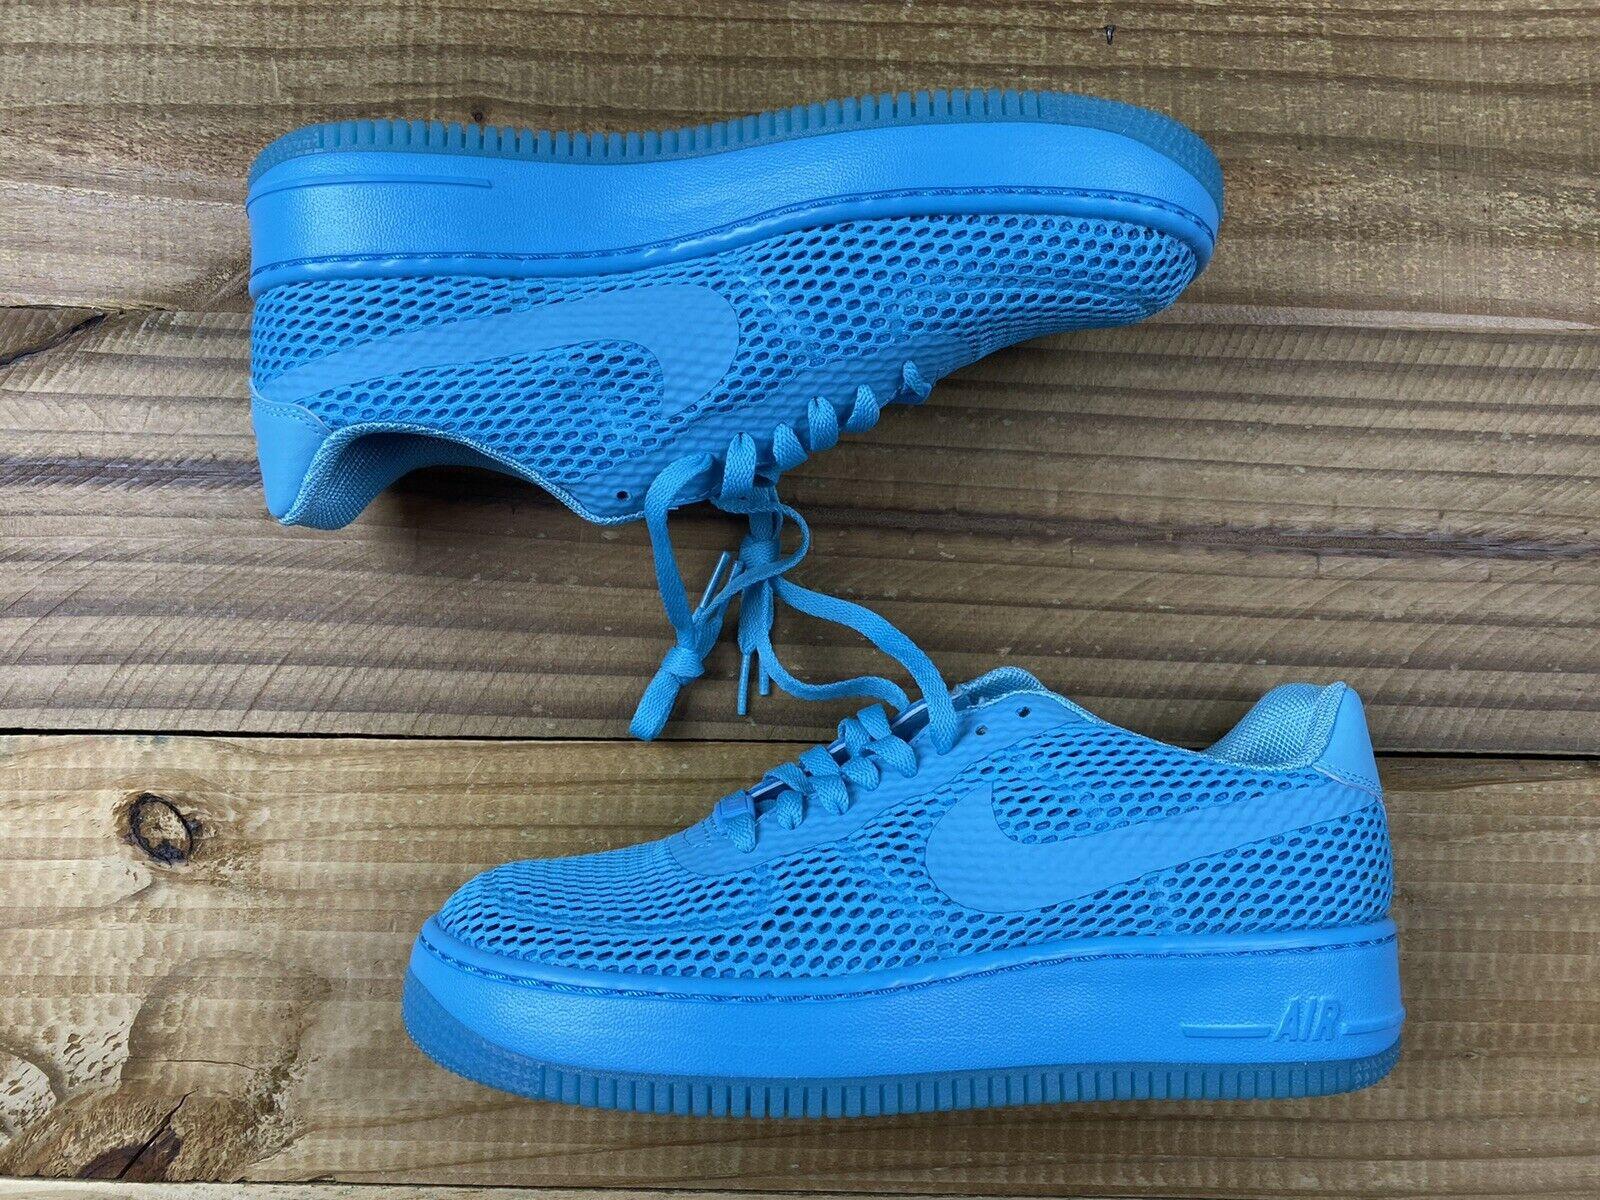 nike air force 1 womens blue